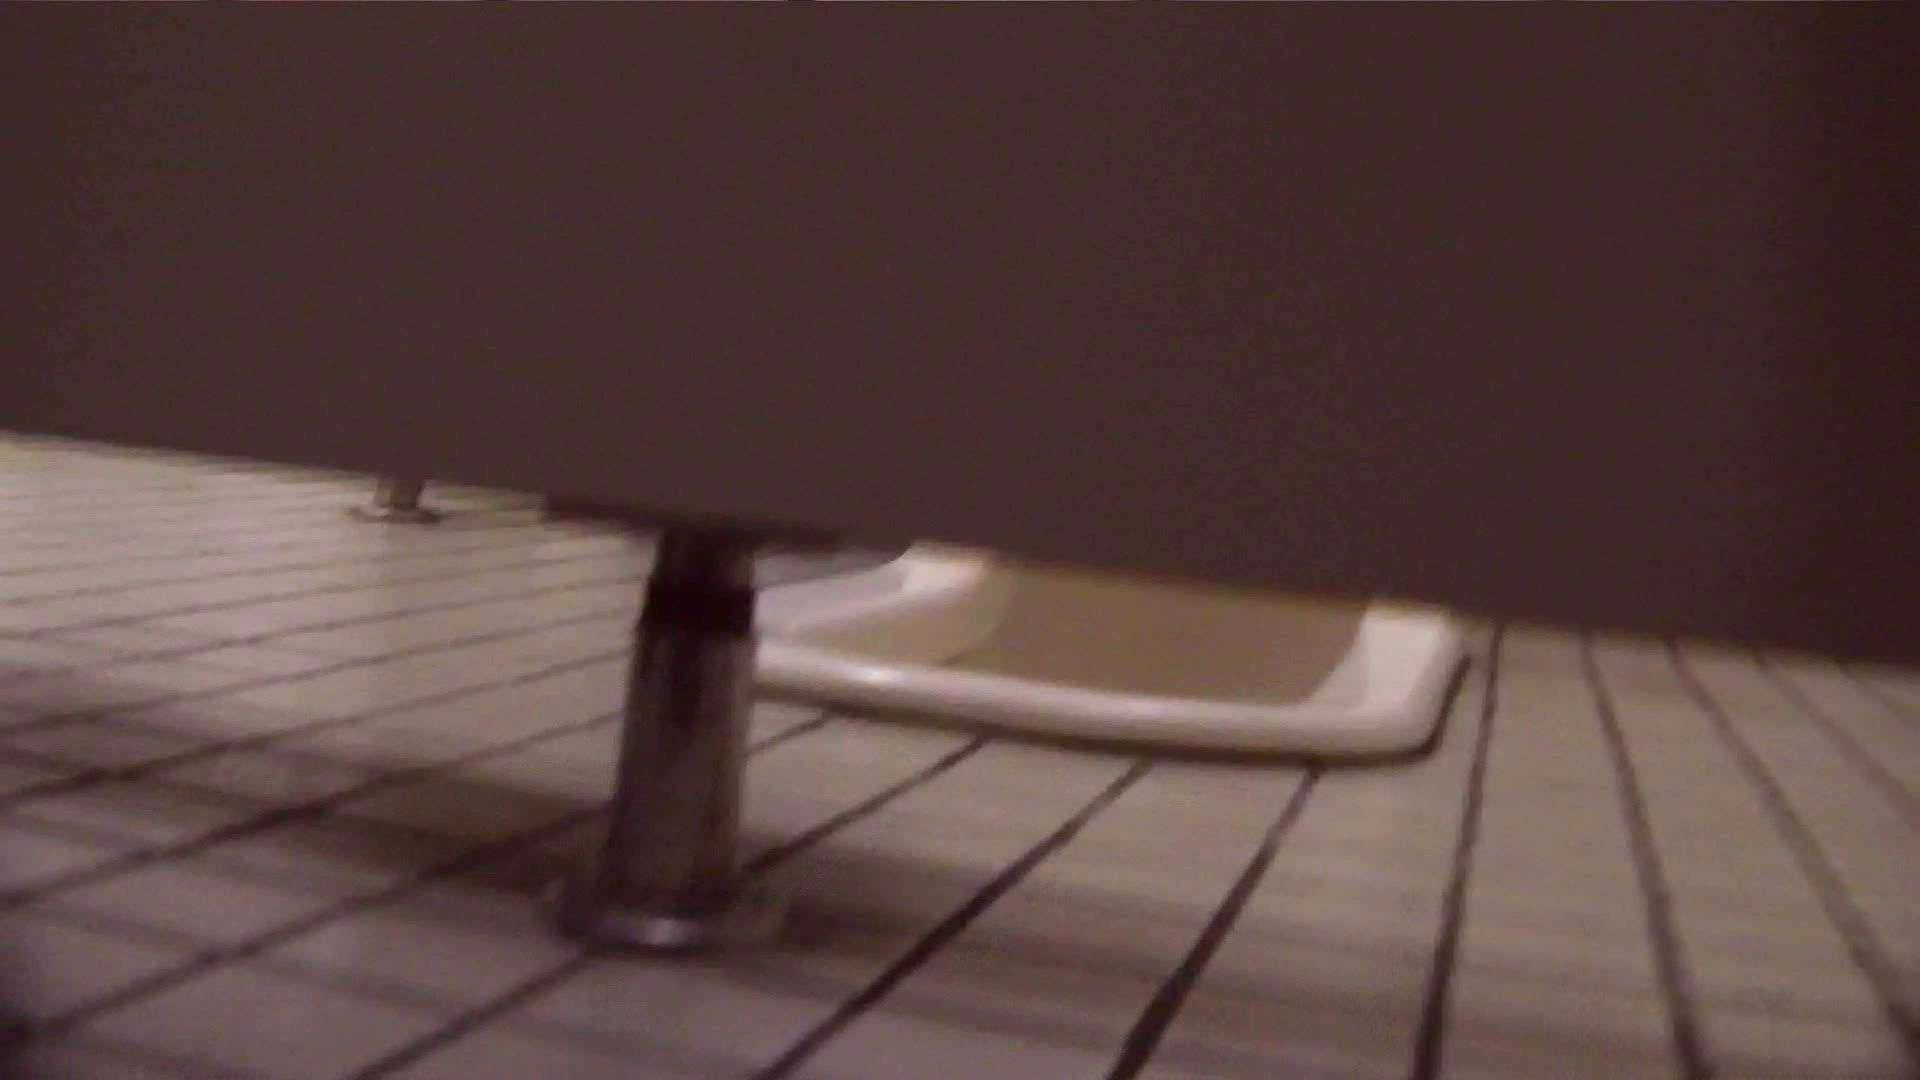 vol.15 命がけ潜伏洗面所! 肌荒れ注意報!! プライベート 隠し撮りすけべAV動画紹介 102画像 43